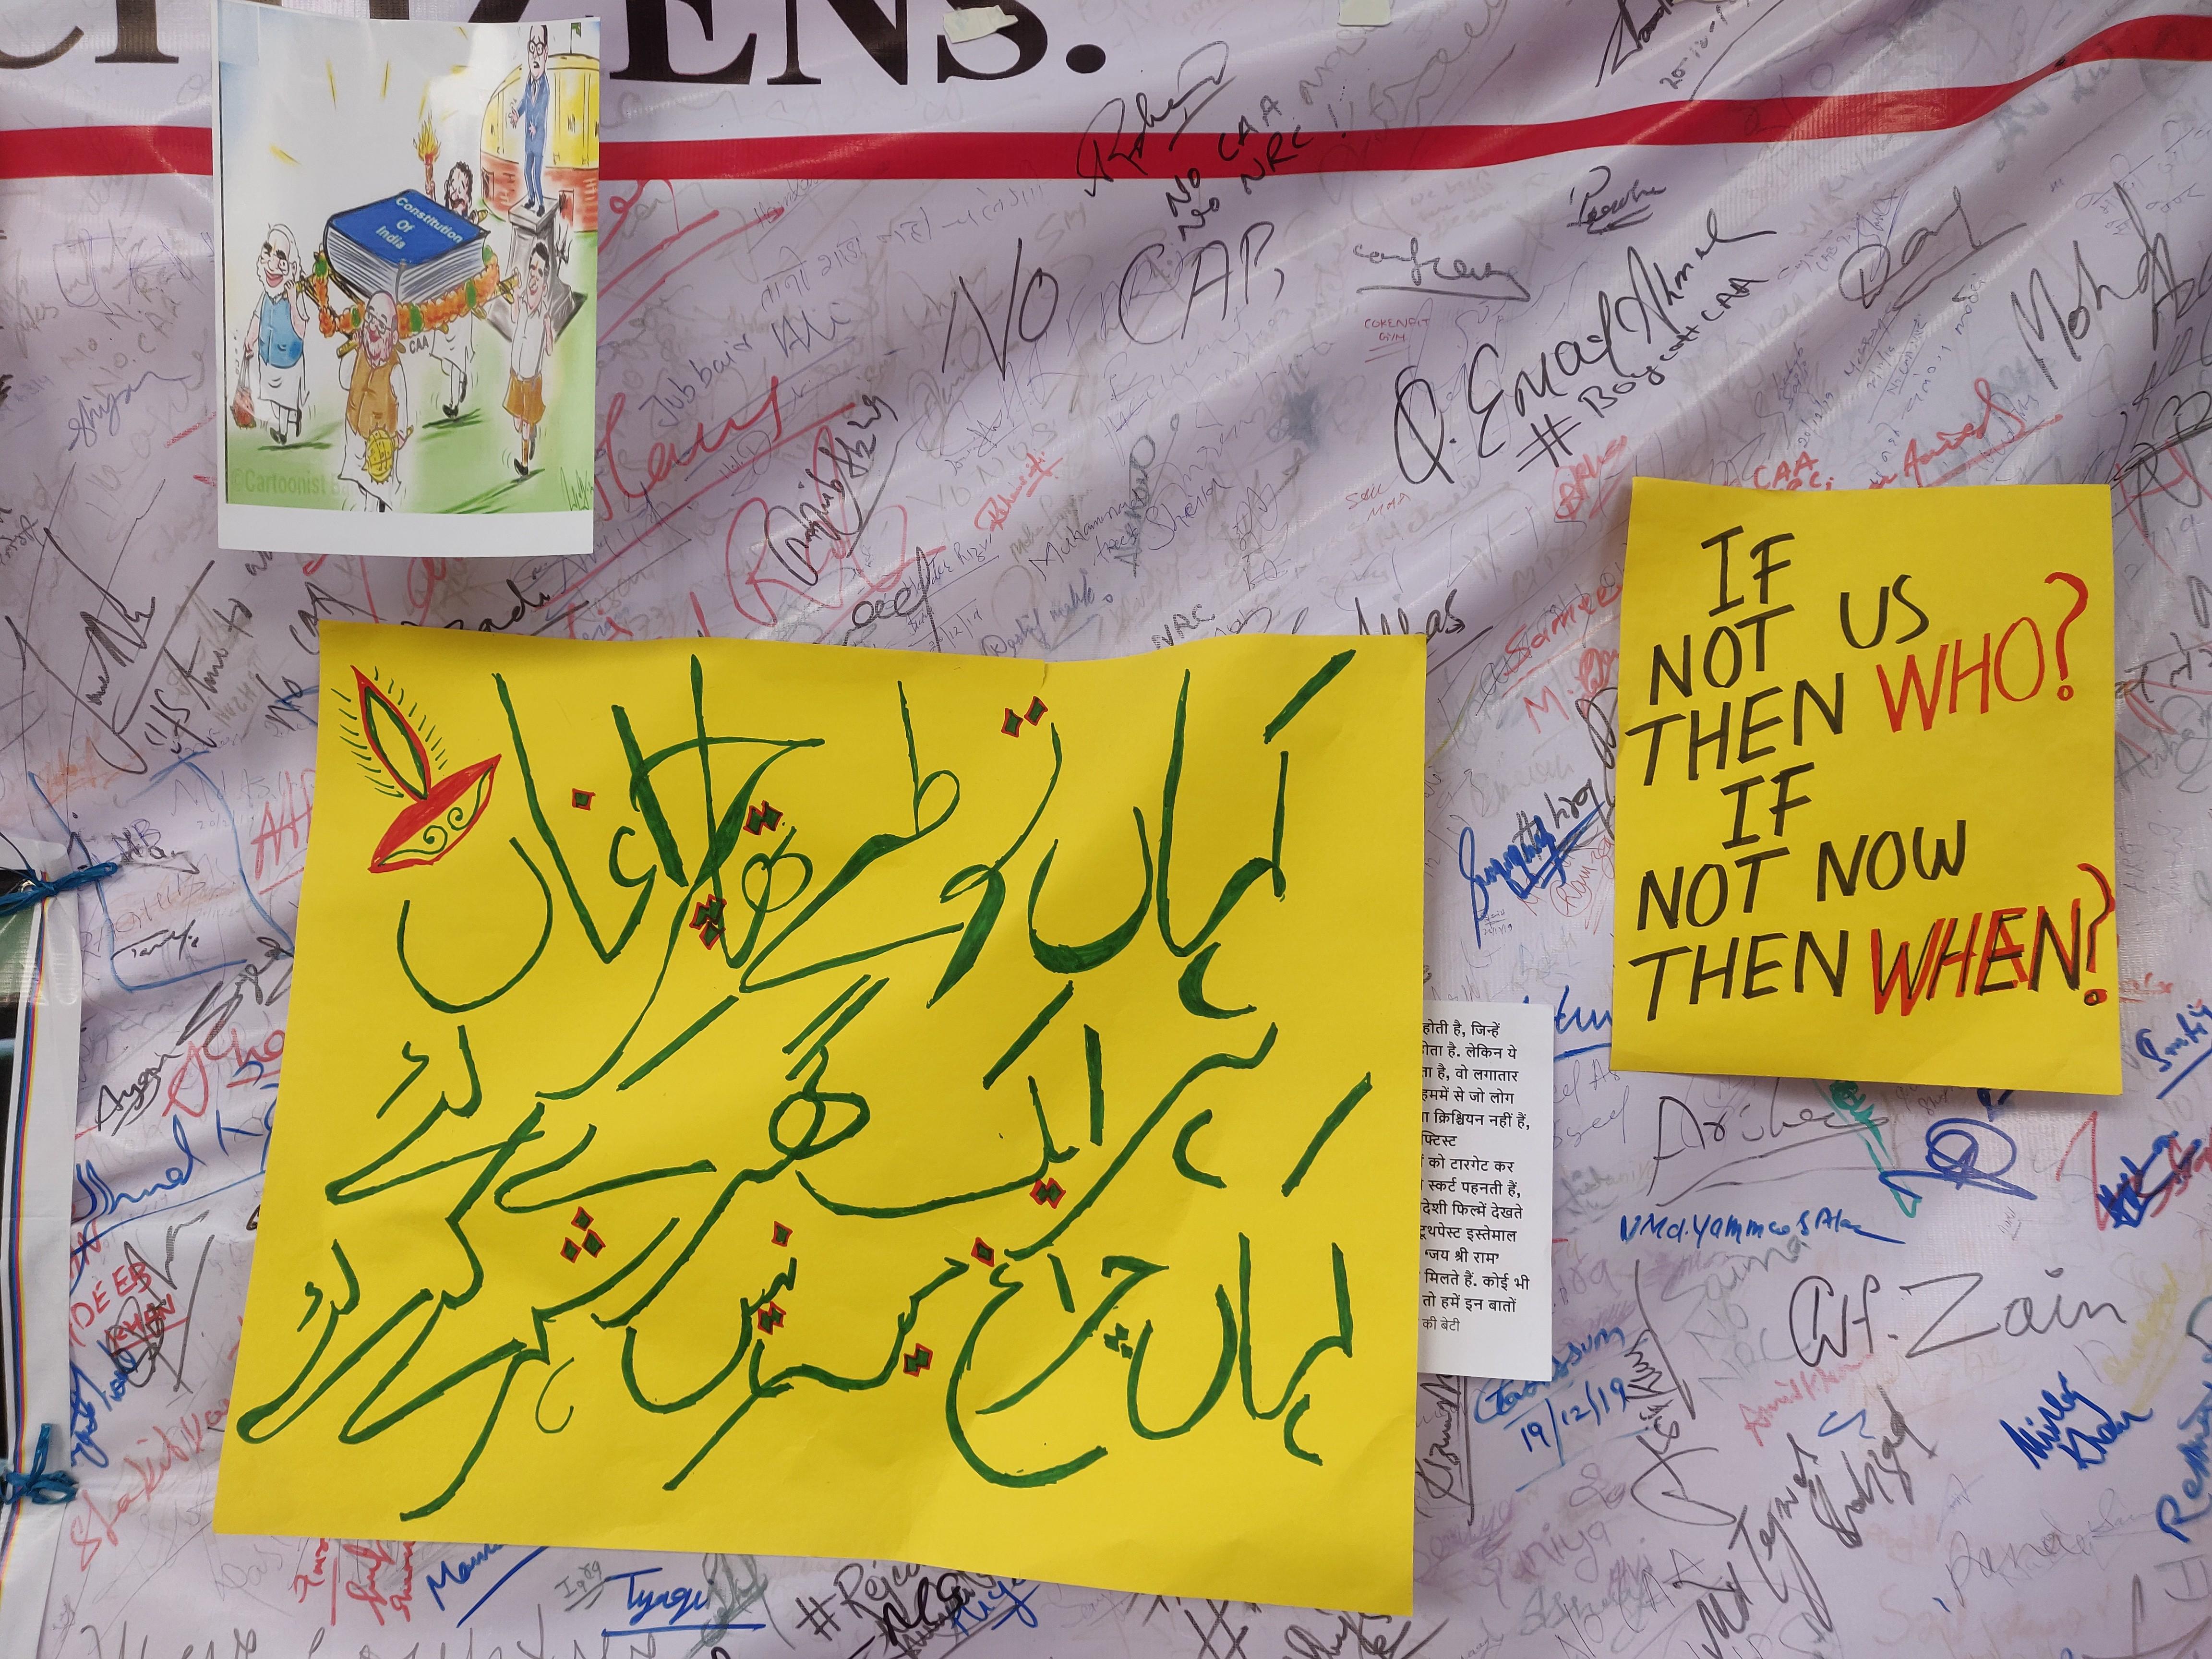 Post-its at the anti-CAA rallying point in Jamia Millia Islamia, Delhi, India, 2020 | J-T.M.